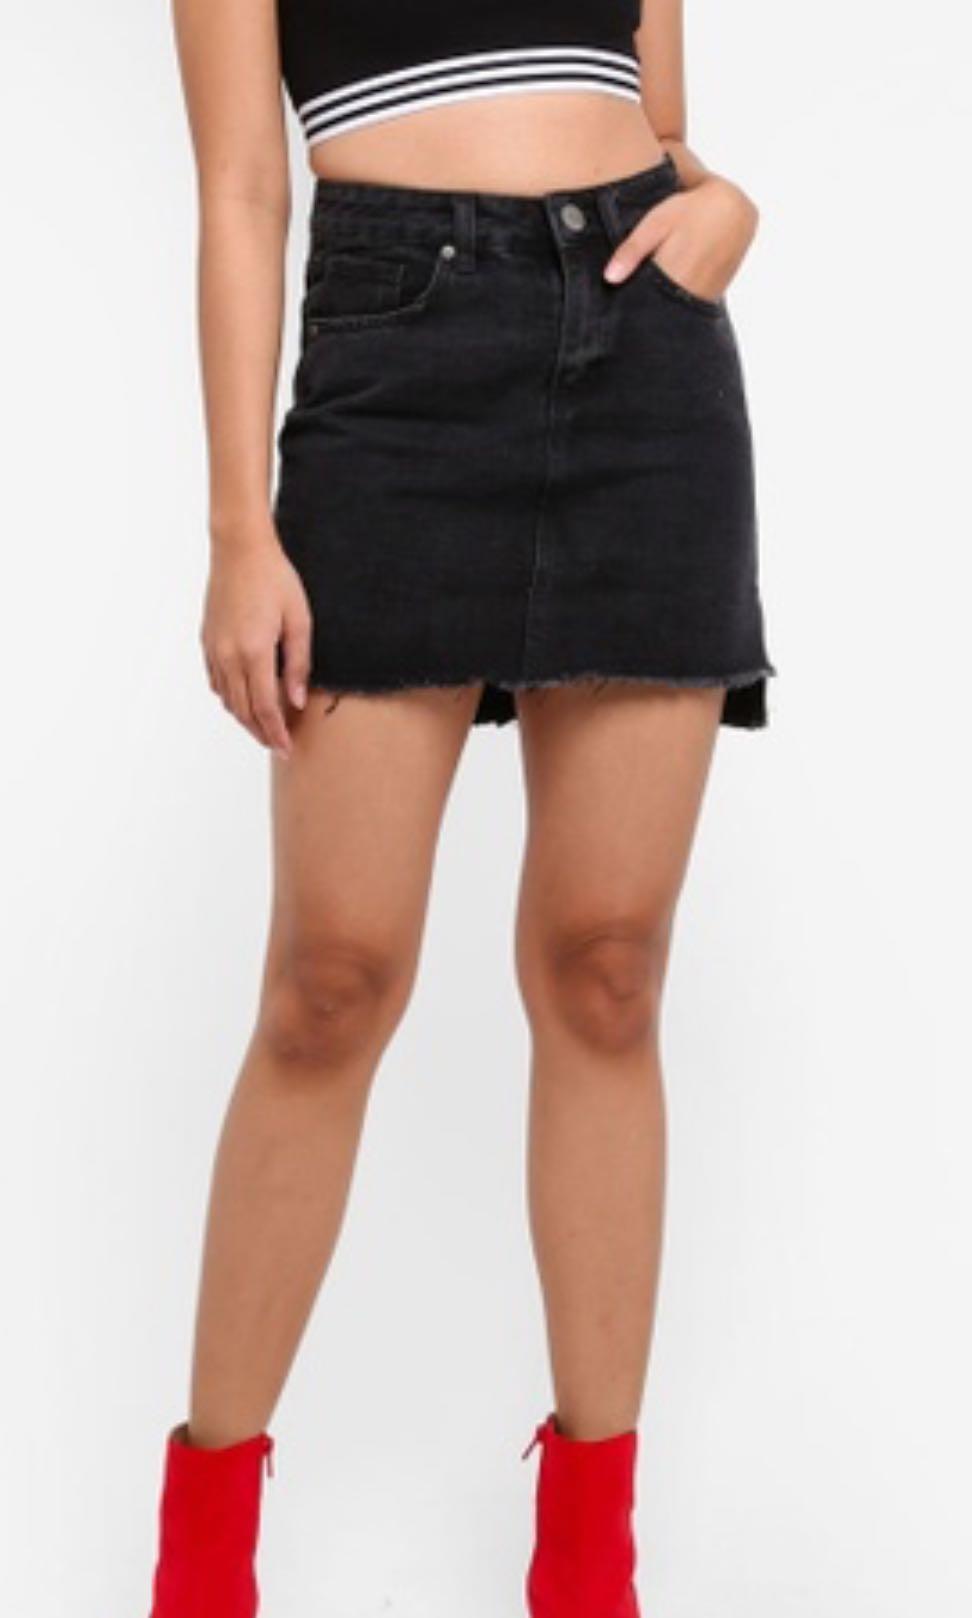 e8d1e1909dd2 BN Factorie Black Denim Skirt, Women's Fashion, Clothes, Dresses ...